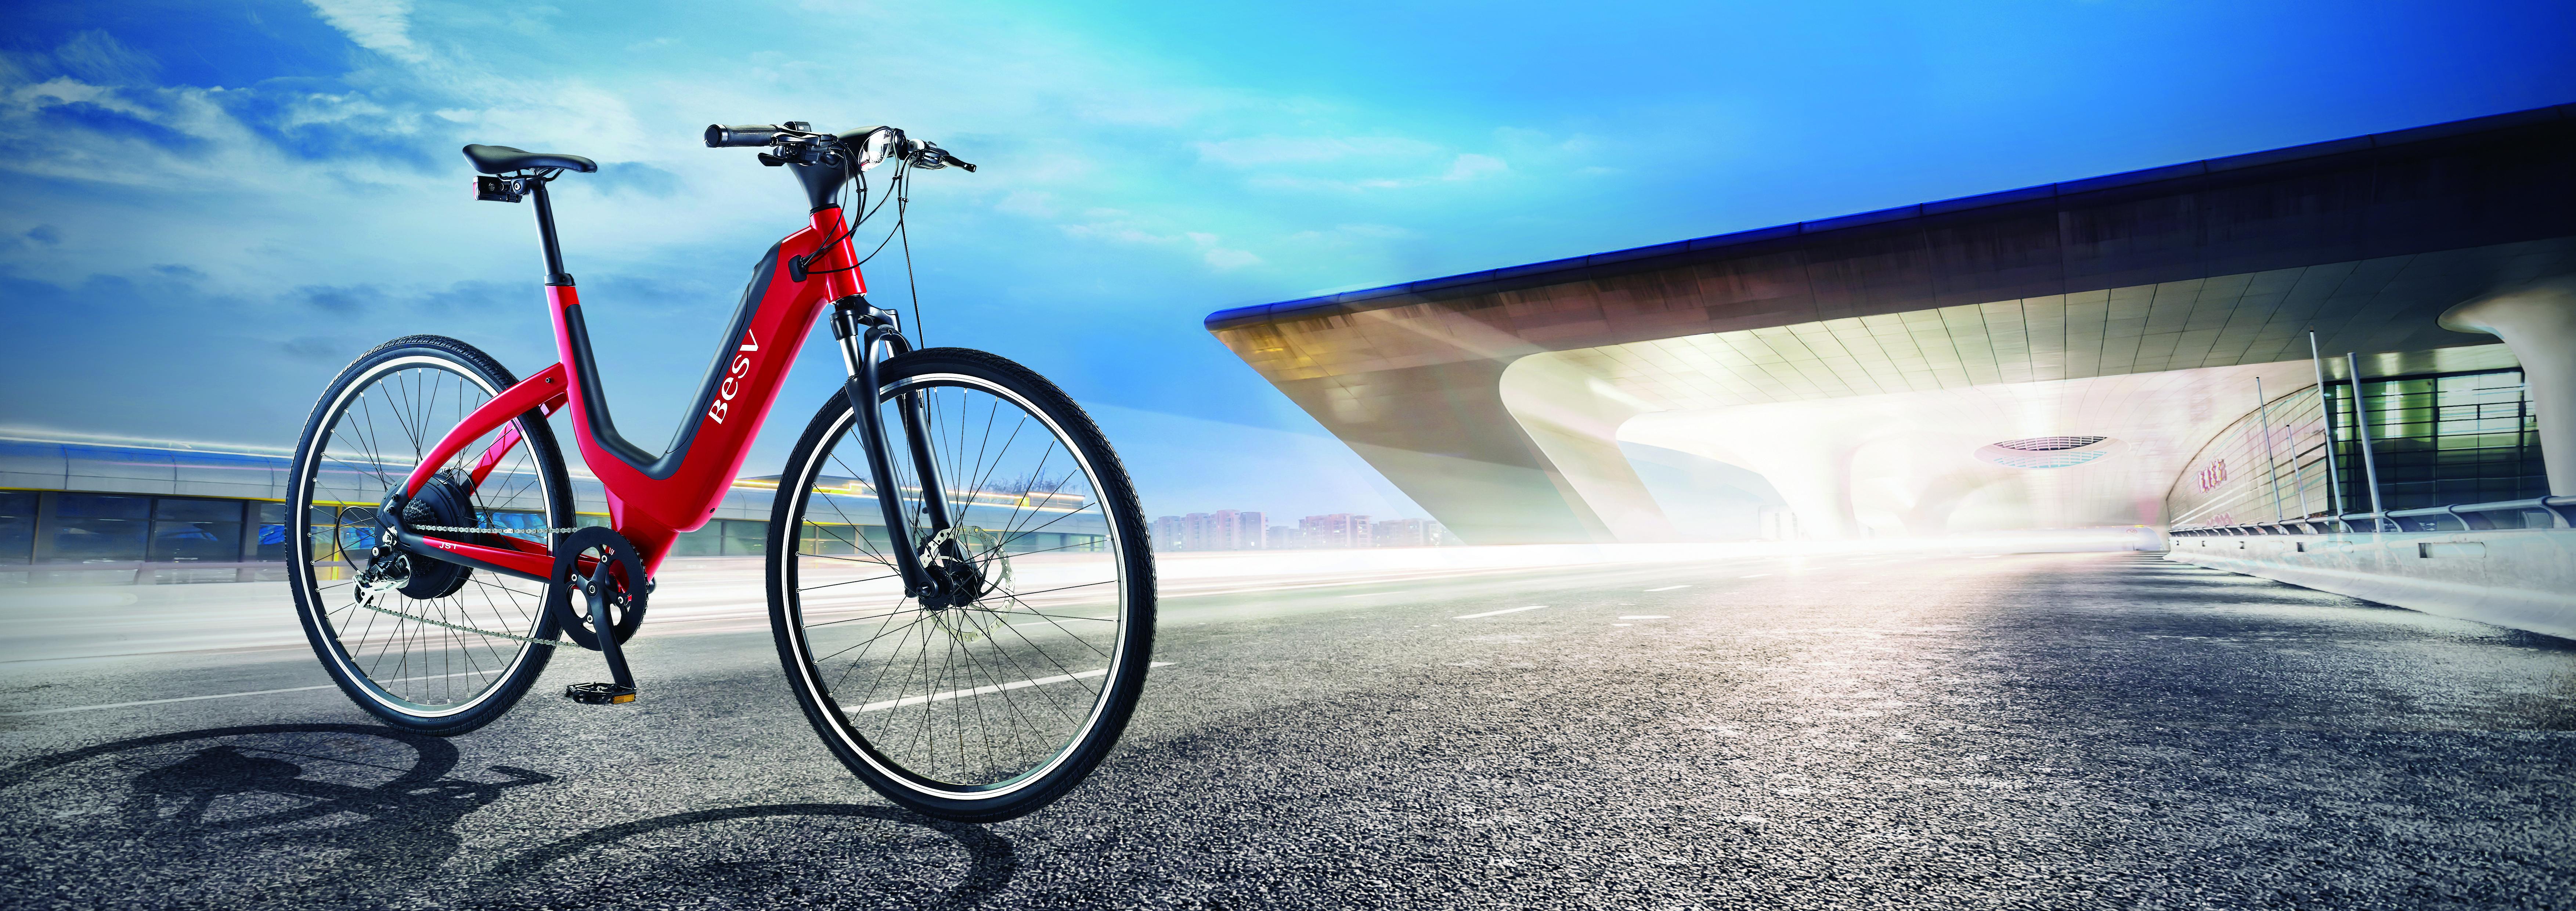 BESV JS1 E Bike